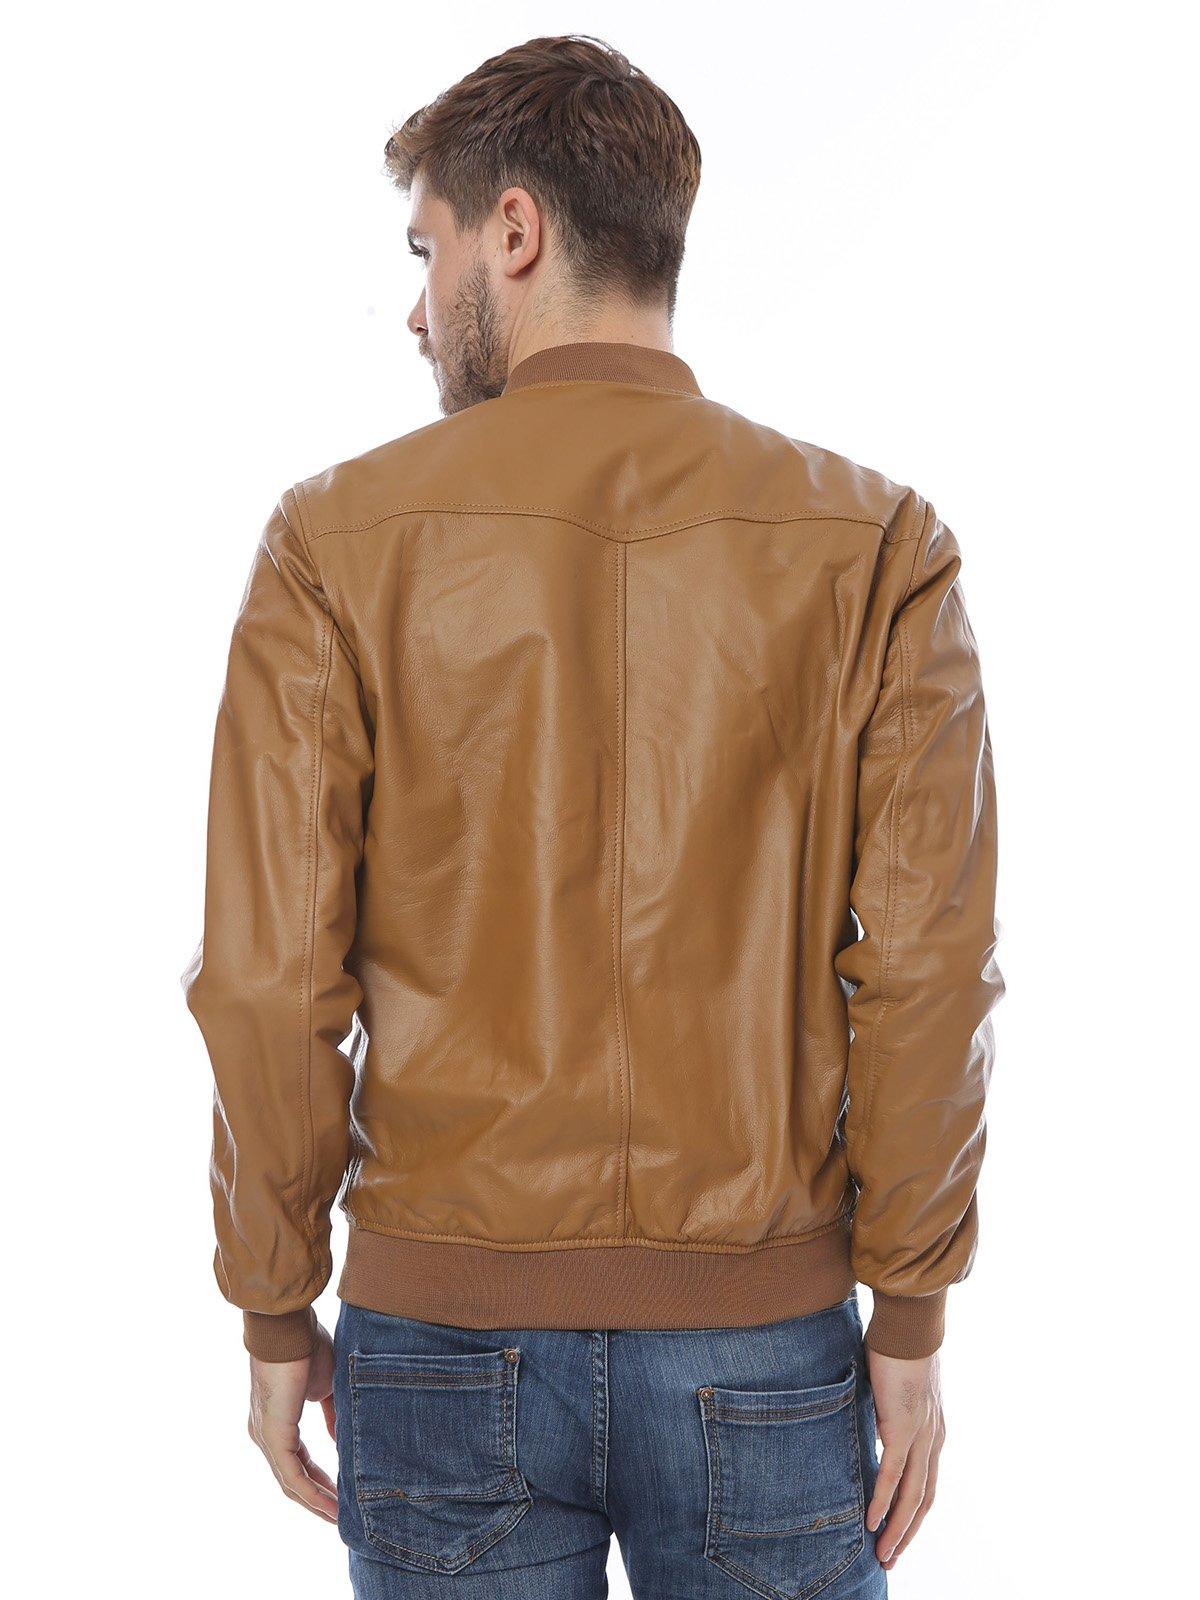 Куртка коньячного цвета | 3010793 | фото 2